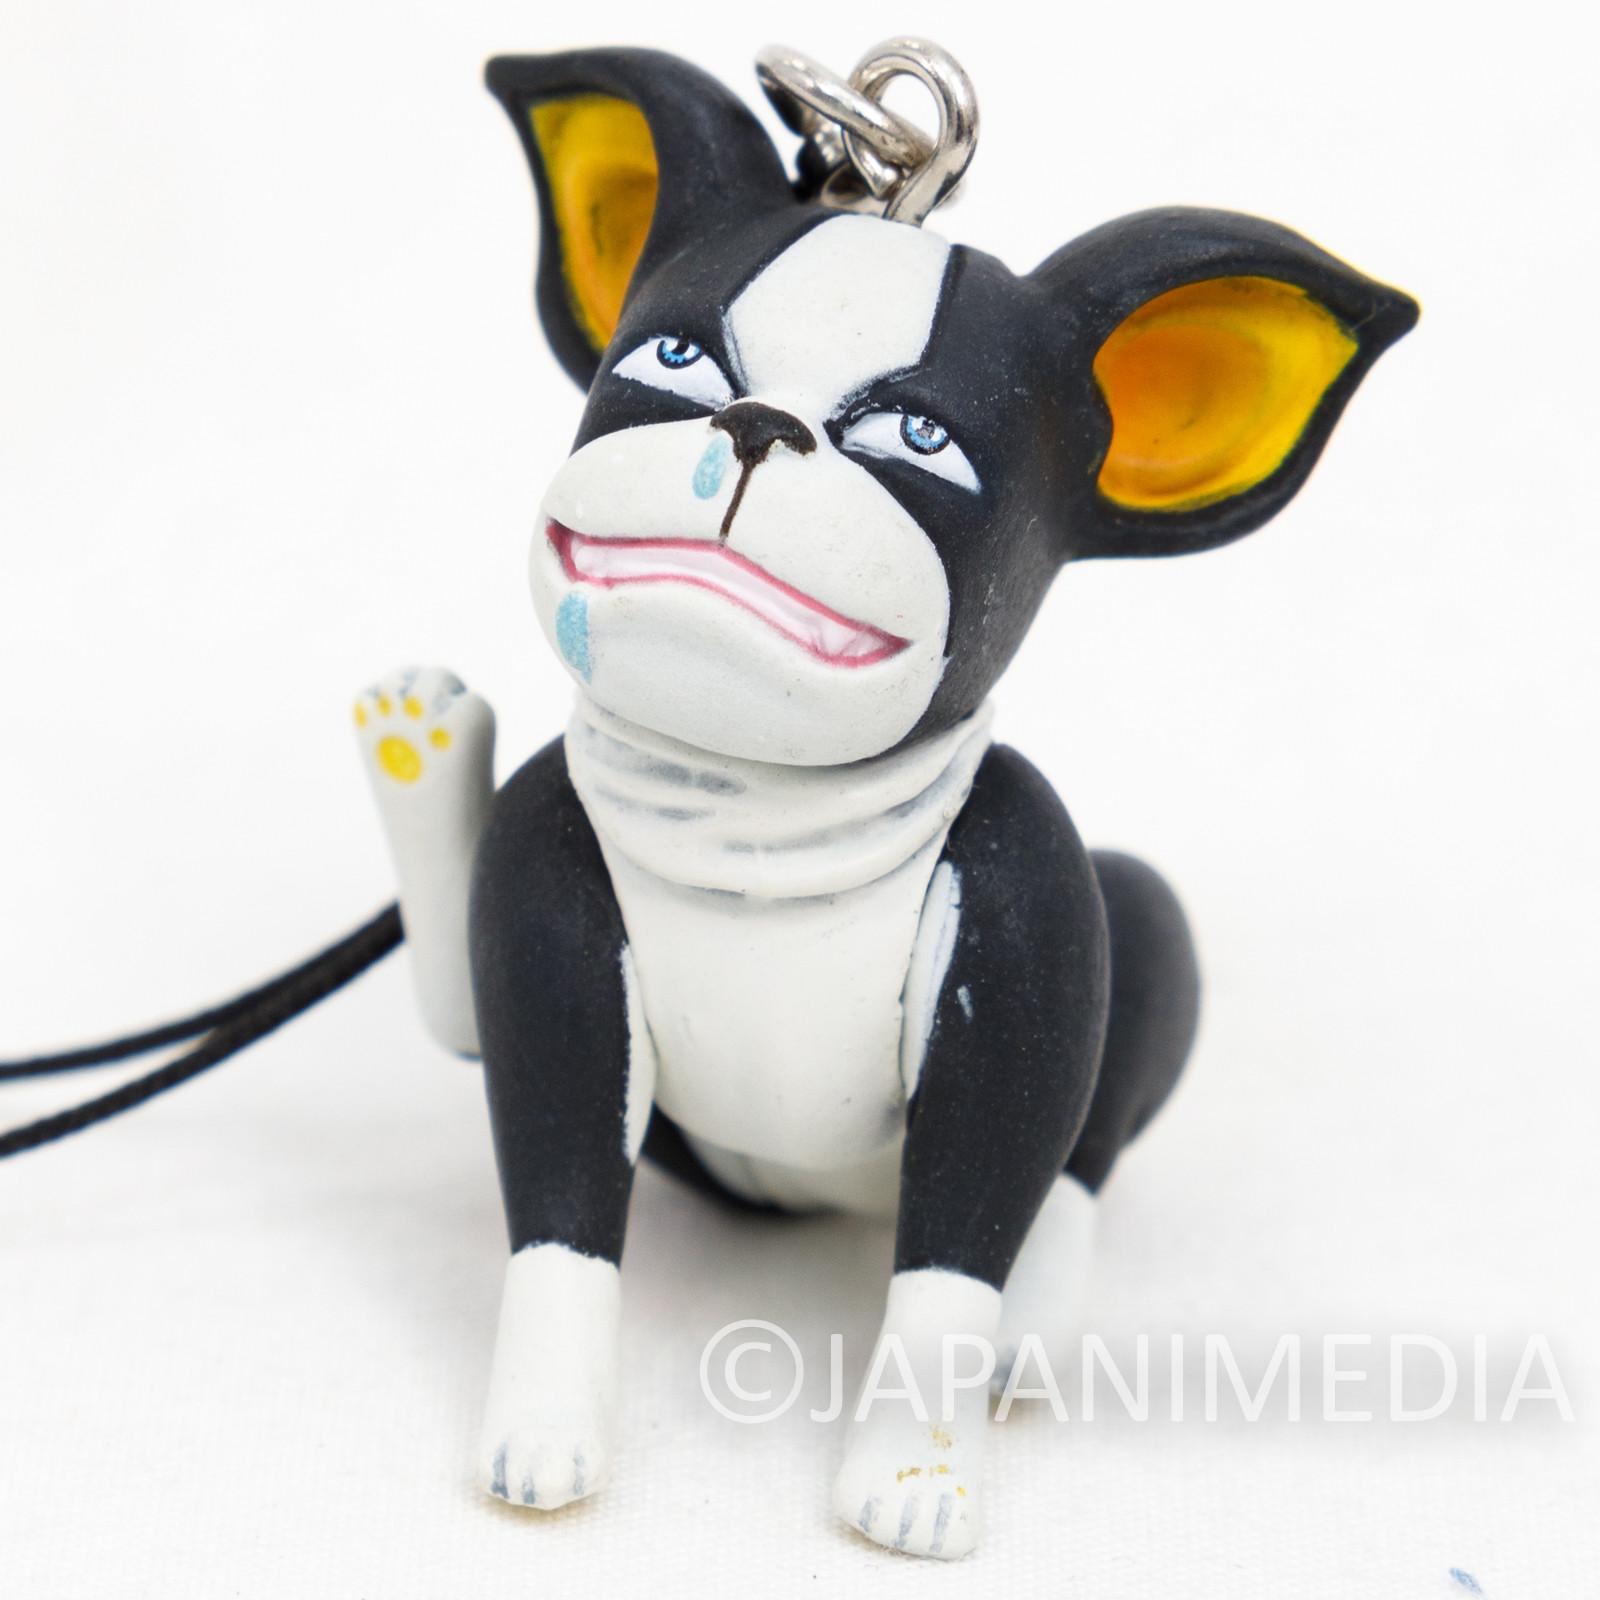 JoJo's Bizarre Adventure IGGY Figure Super Strap Collection ver. C JAPAN ANIME